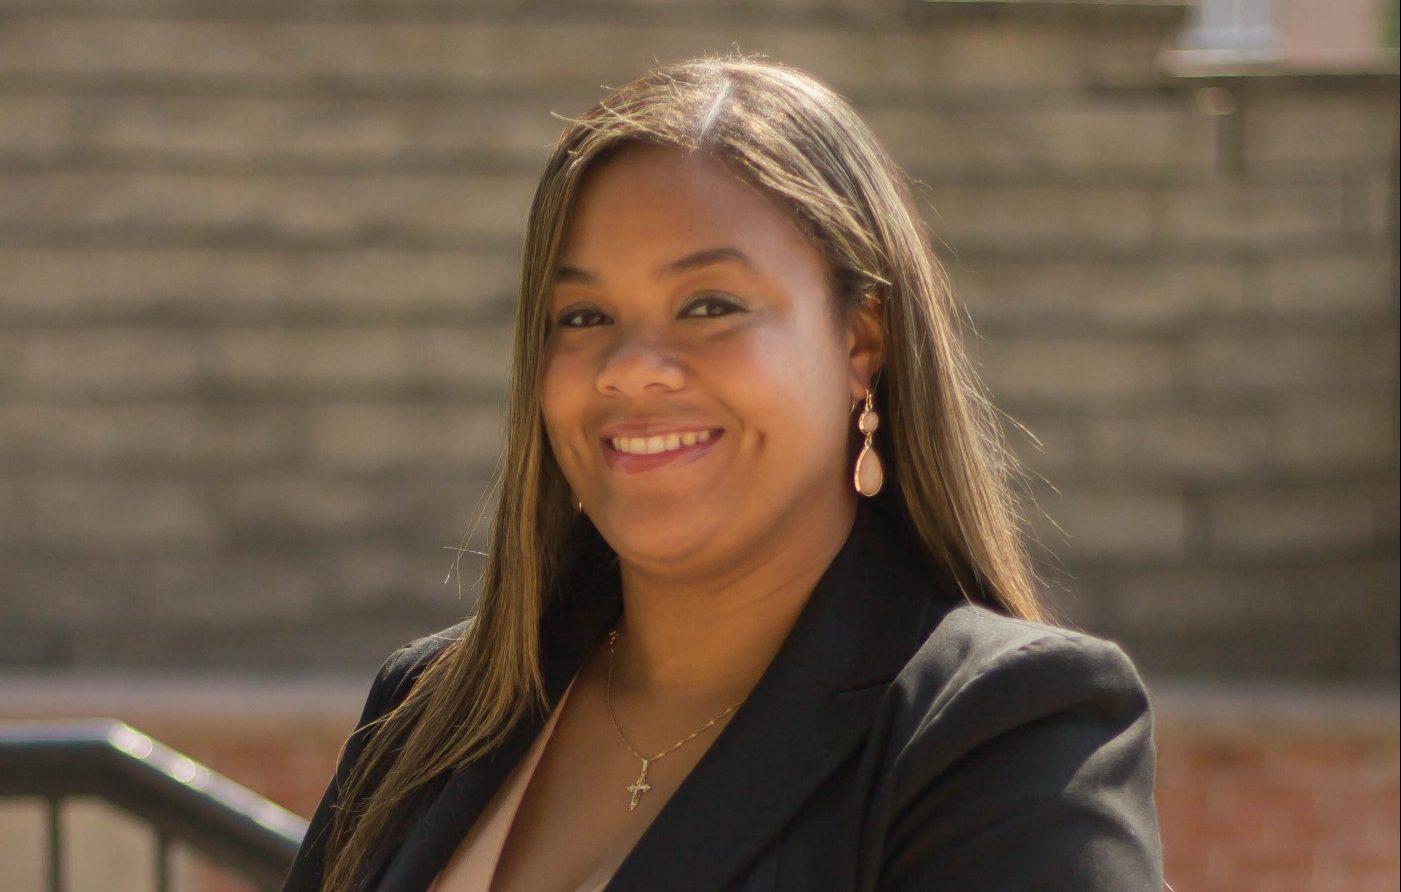 Lee Anne Crockett, leadership & career strategist